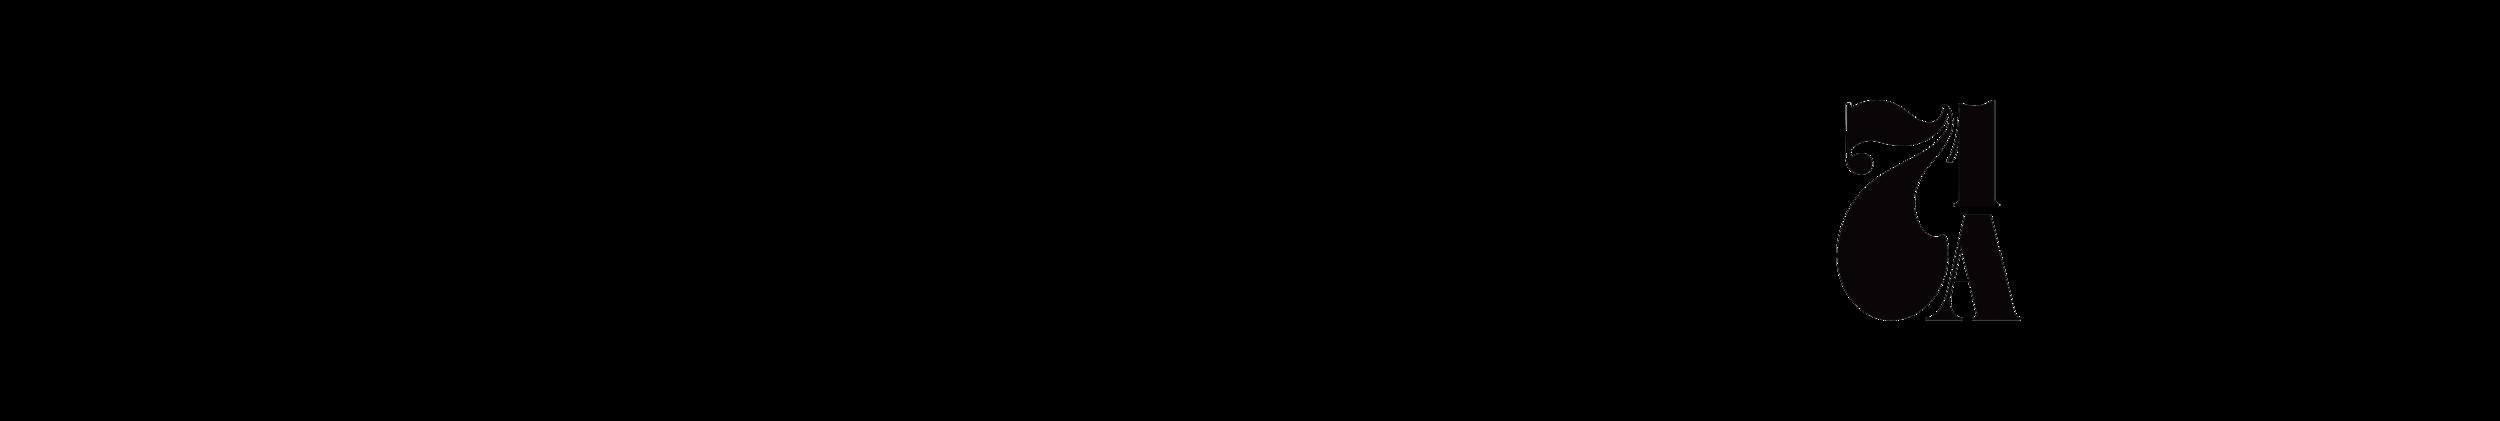 Agency Logos.png